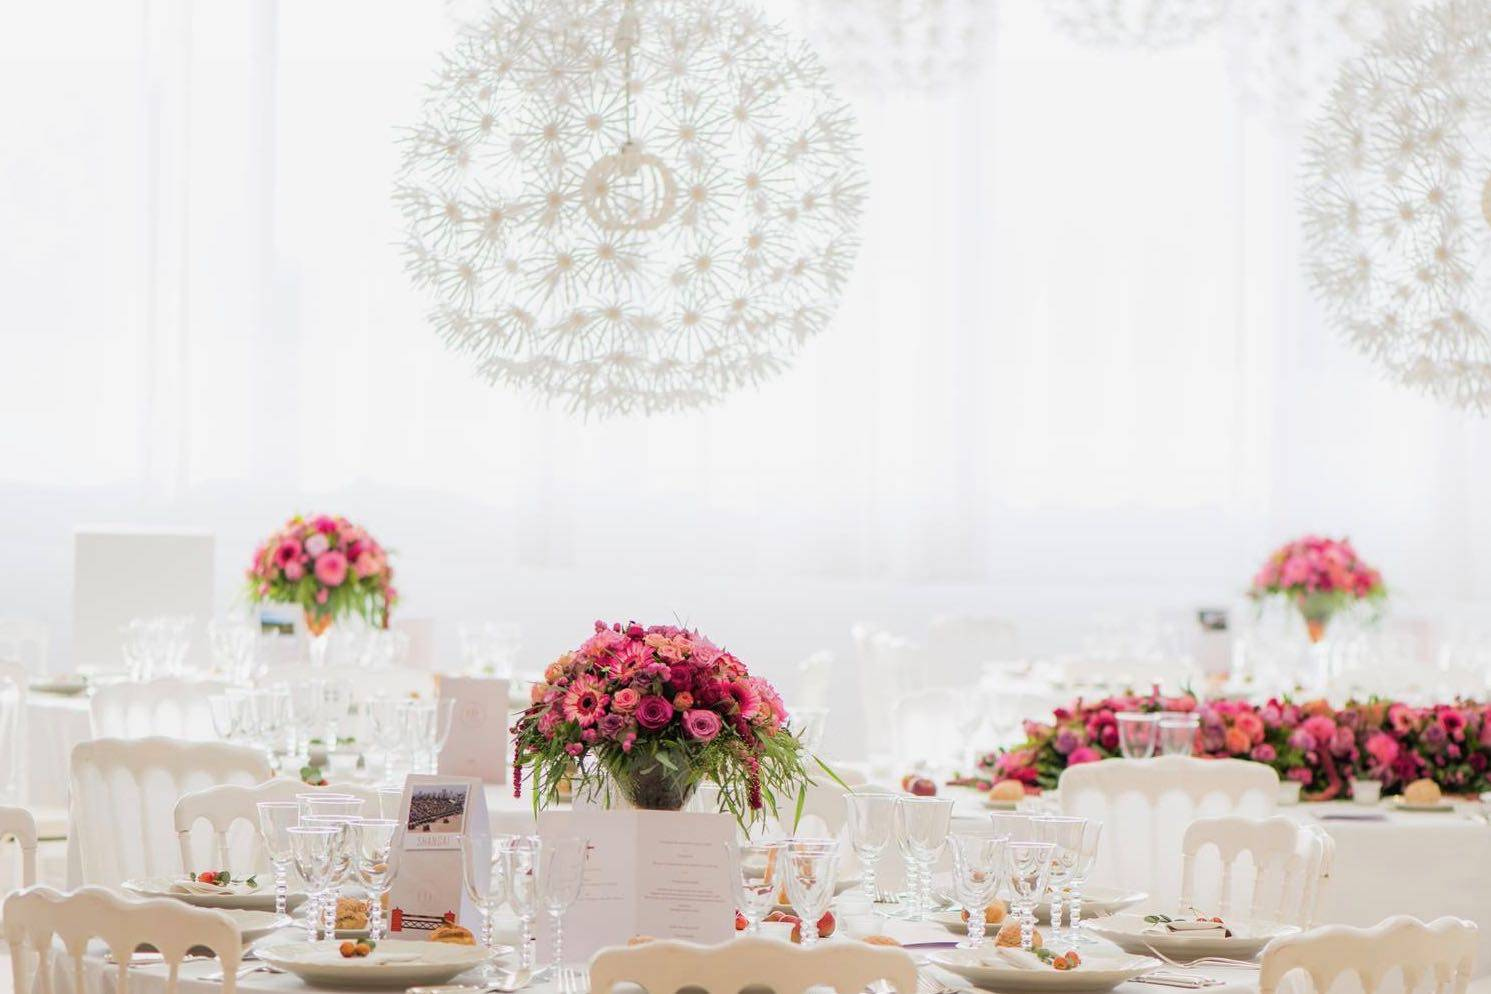 Feriatus - Wedding planner - House of Events  - 6